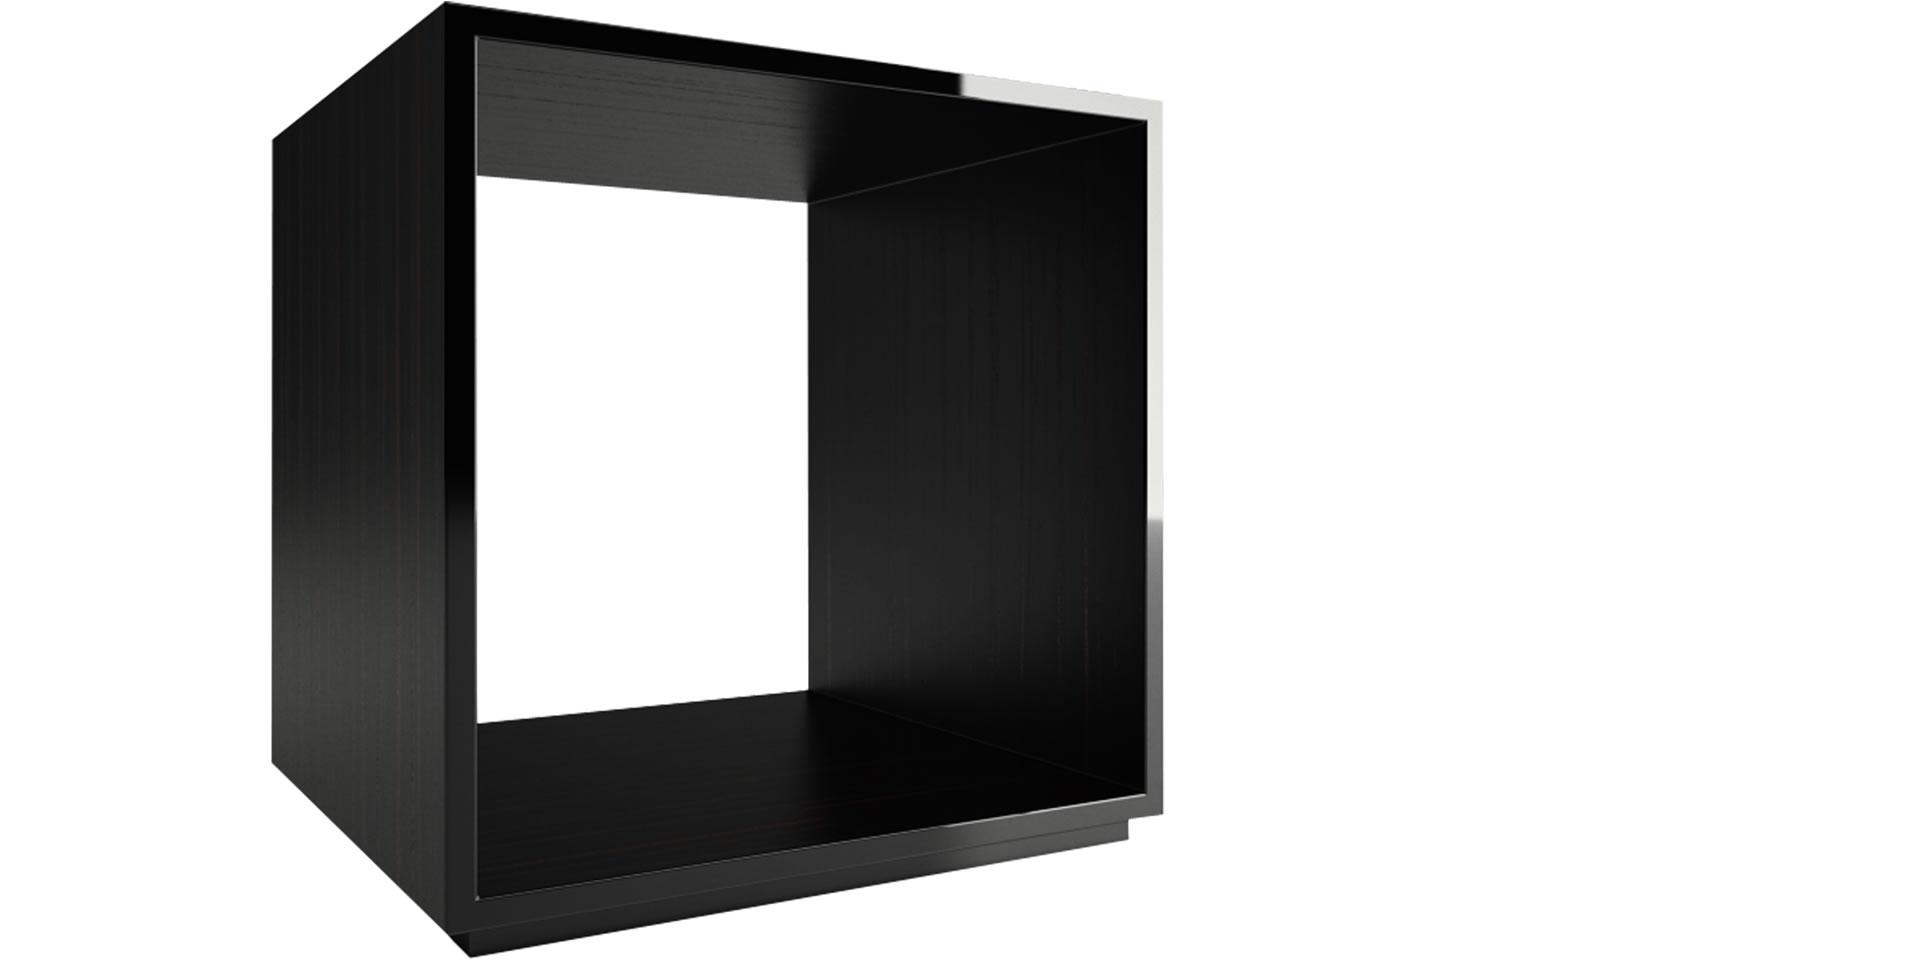 regalsystem lectulus quadratische design w rfel von rechteck. Black Bedroom Furniture Sets. Home Design Ideas